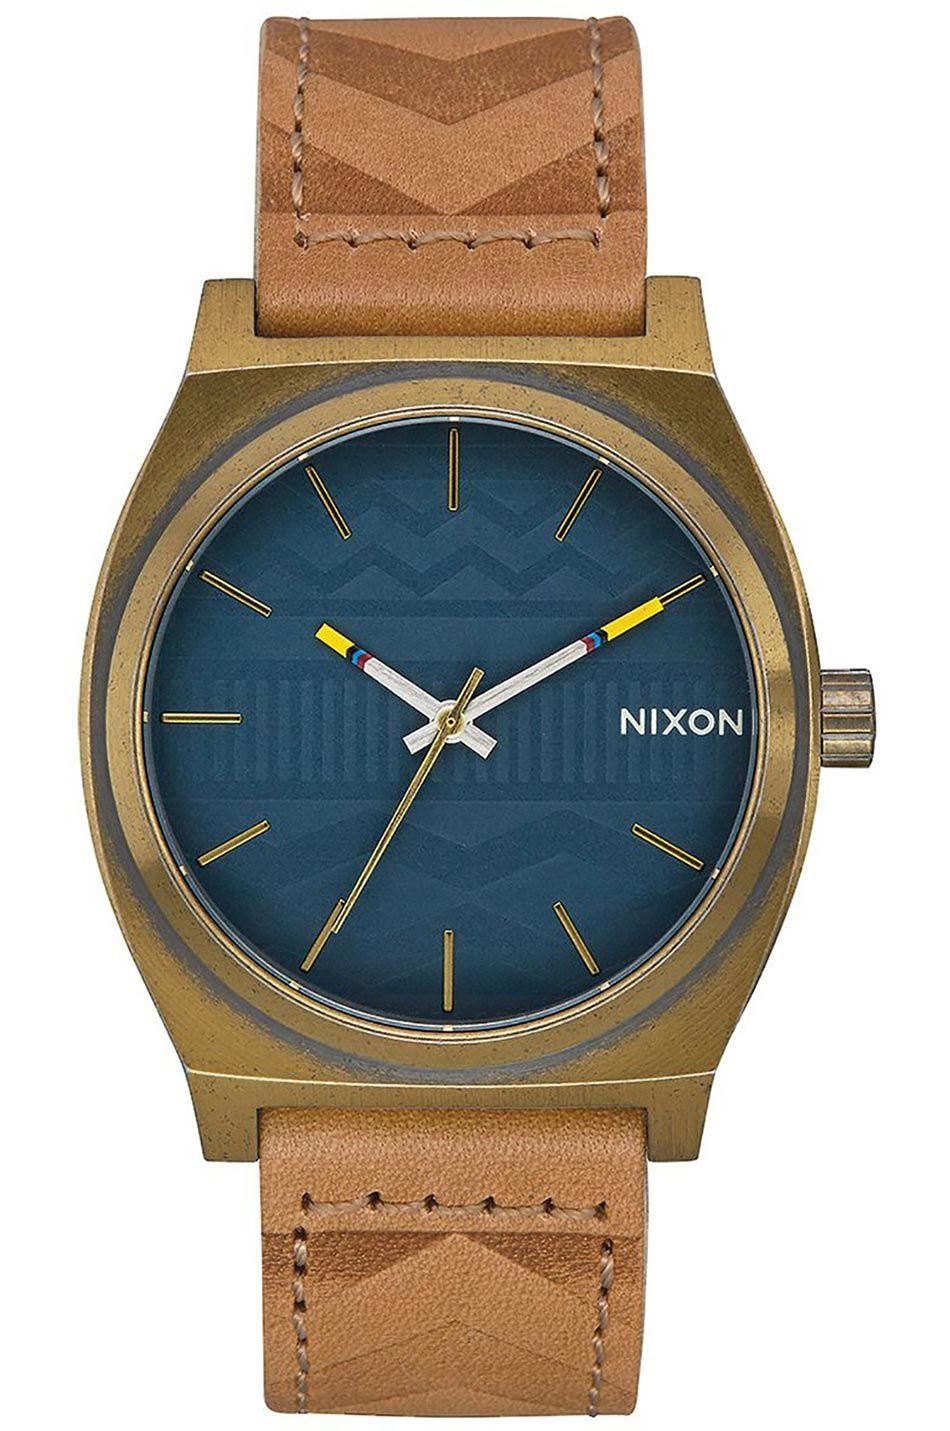 Relogio Nixon Time Teller Brass/Navy/Hickory